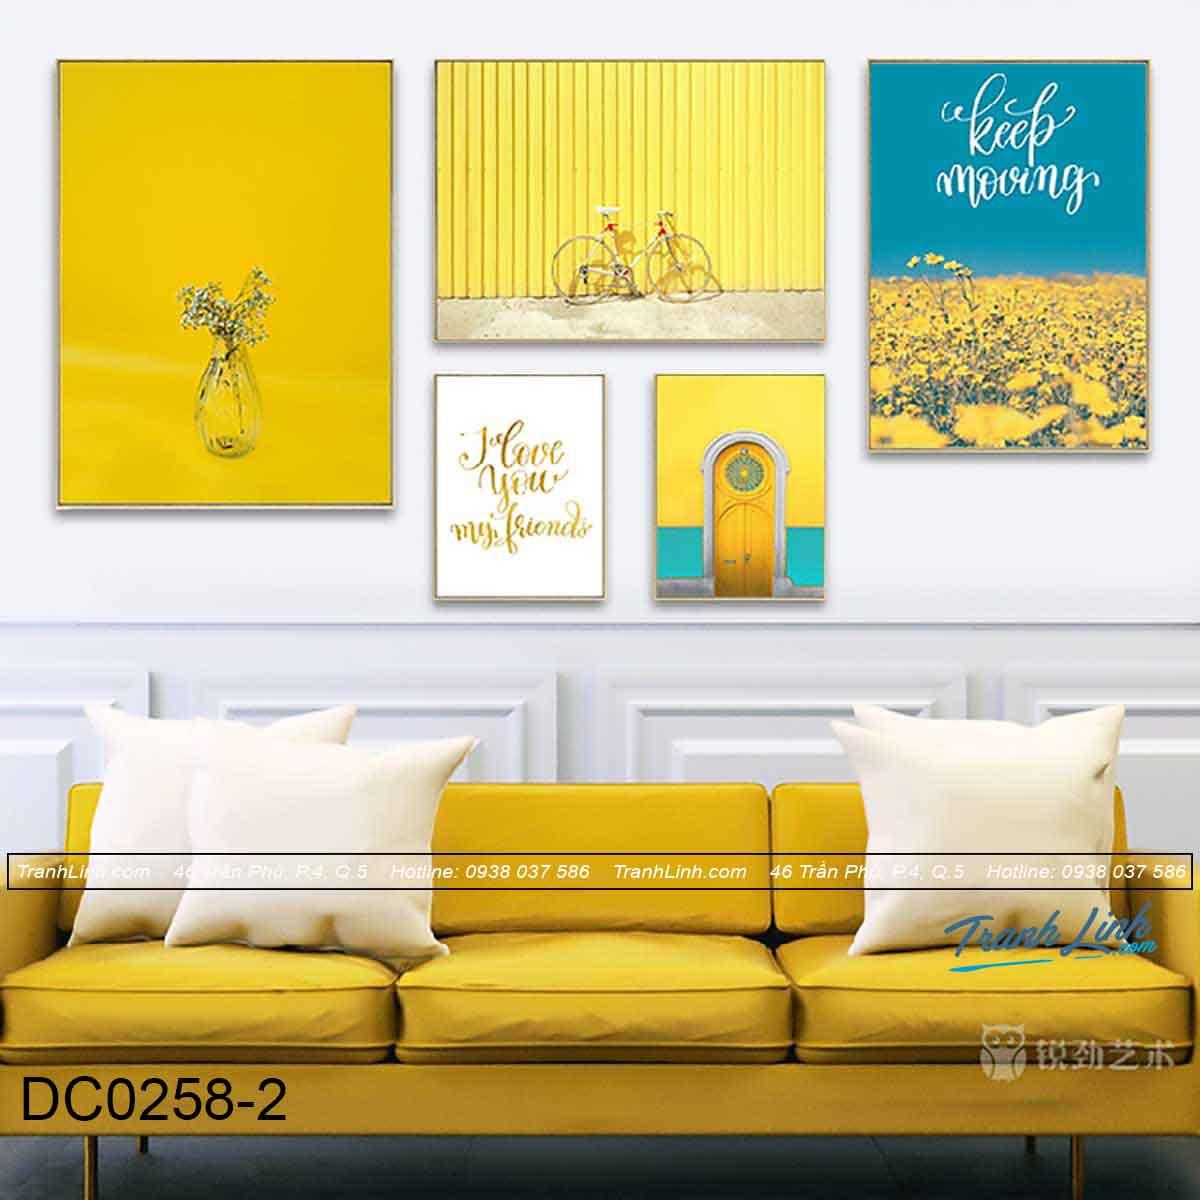 bo tranh canvas trang tri decor dc0258 1